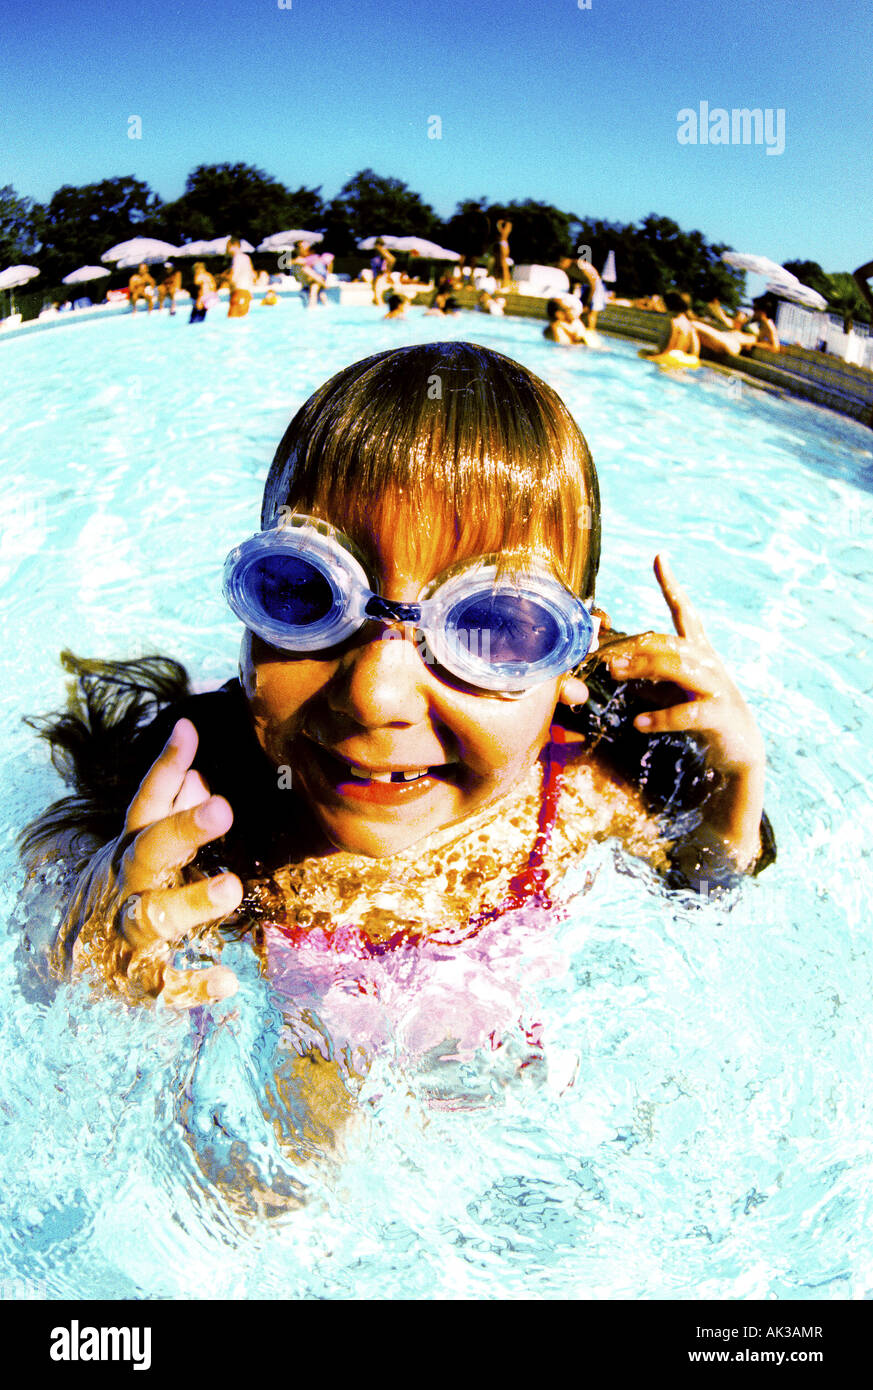 Girl (6-7) in swimming pool, portrait Photo Stock